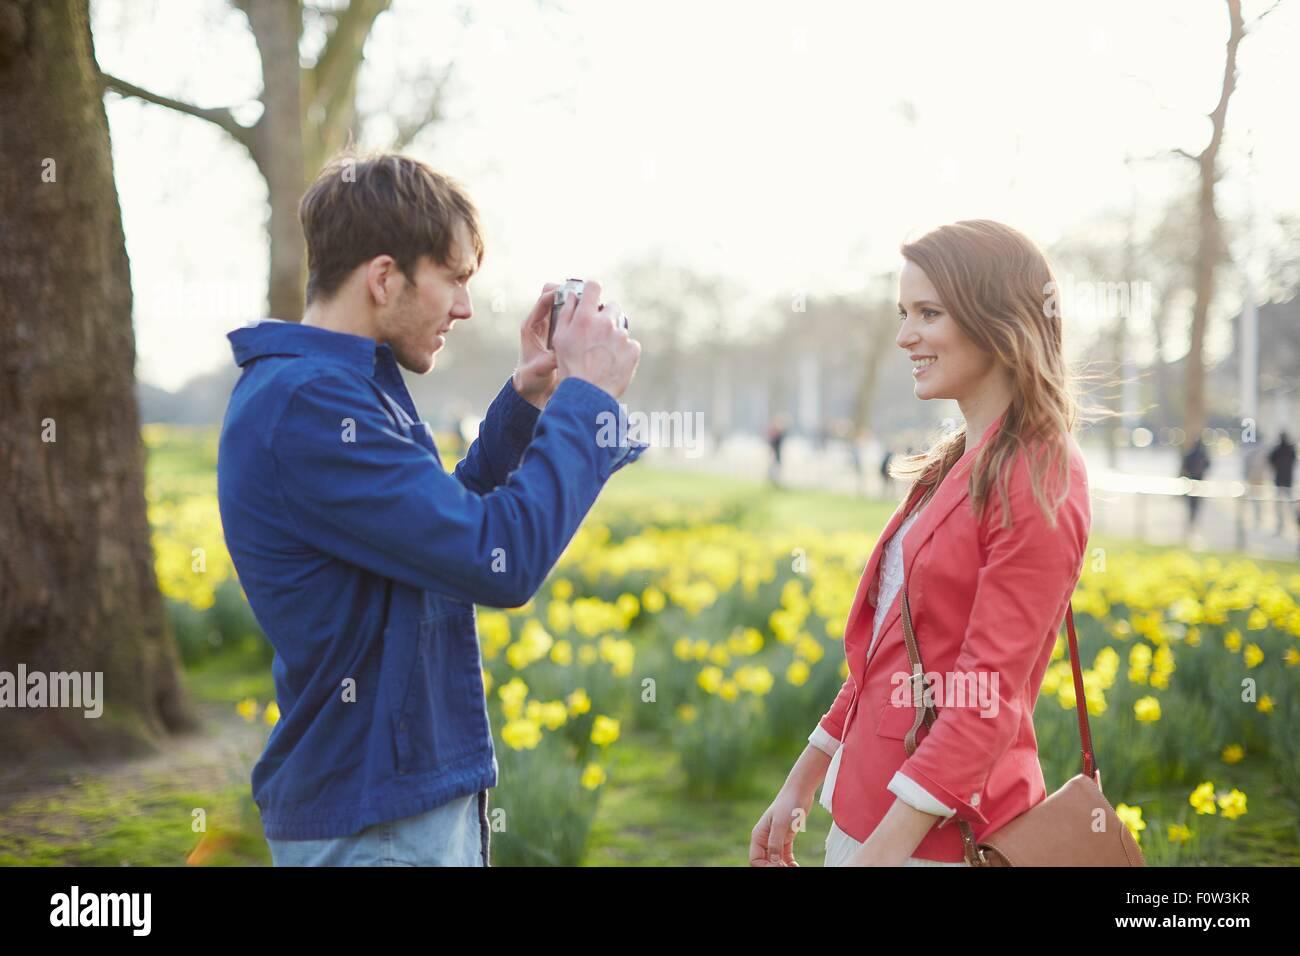 Mitad hombre adulto fotografiar novia en Park, Londres, Reino Unido. Imagen De Stock